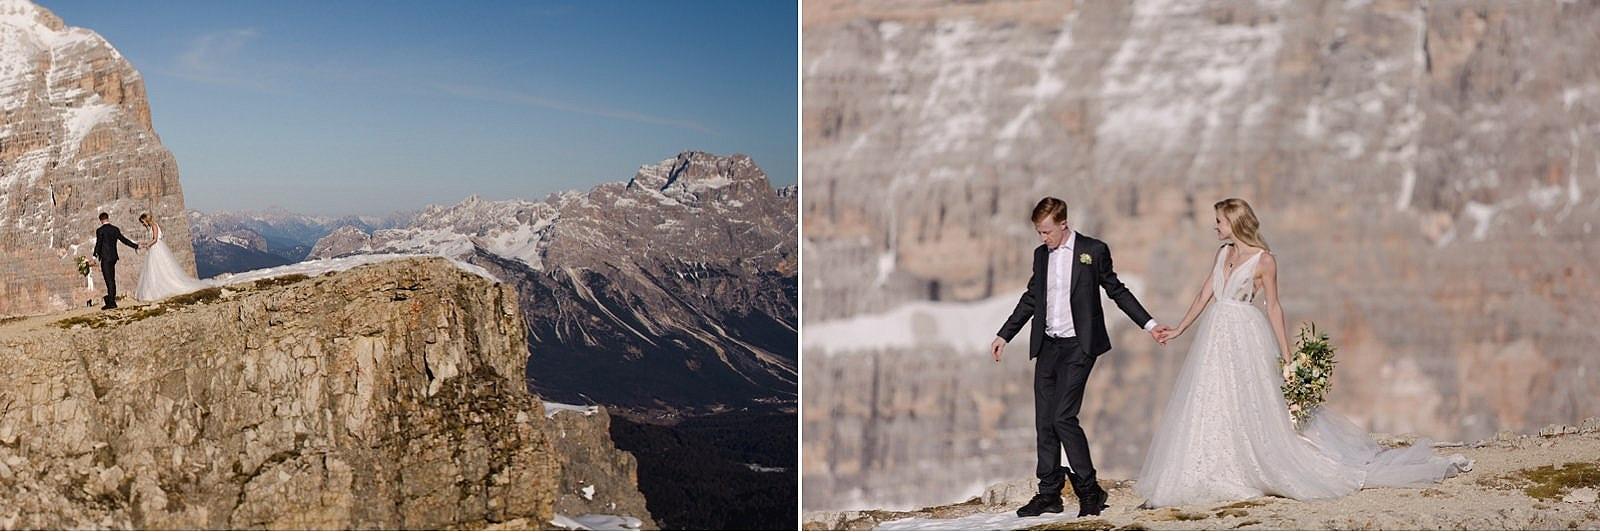 Adventurous+Dolomites+Elopement+Wedding+Fotomagoria46.jpg